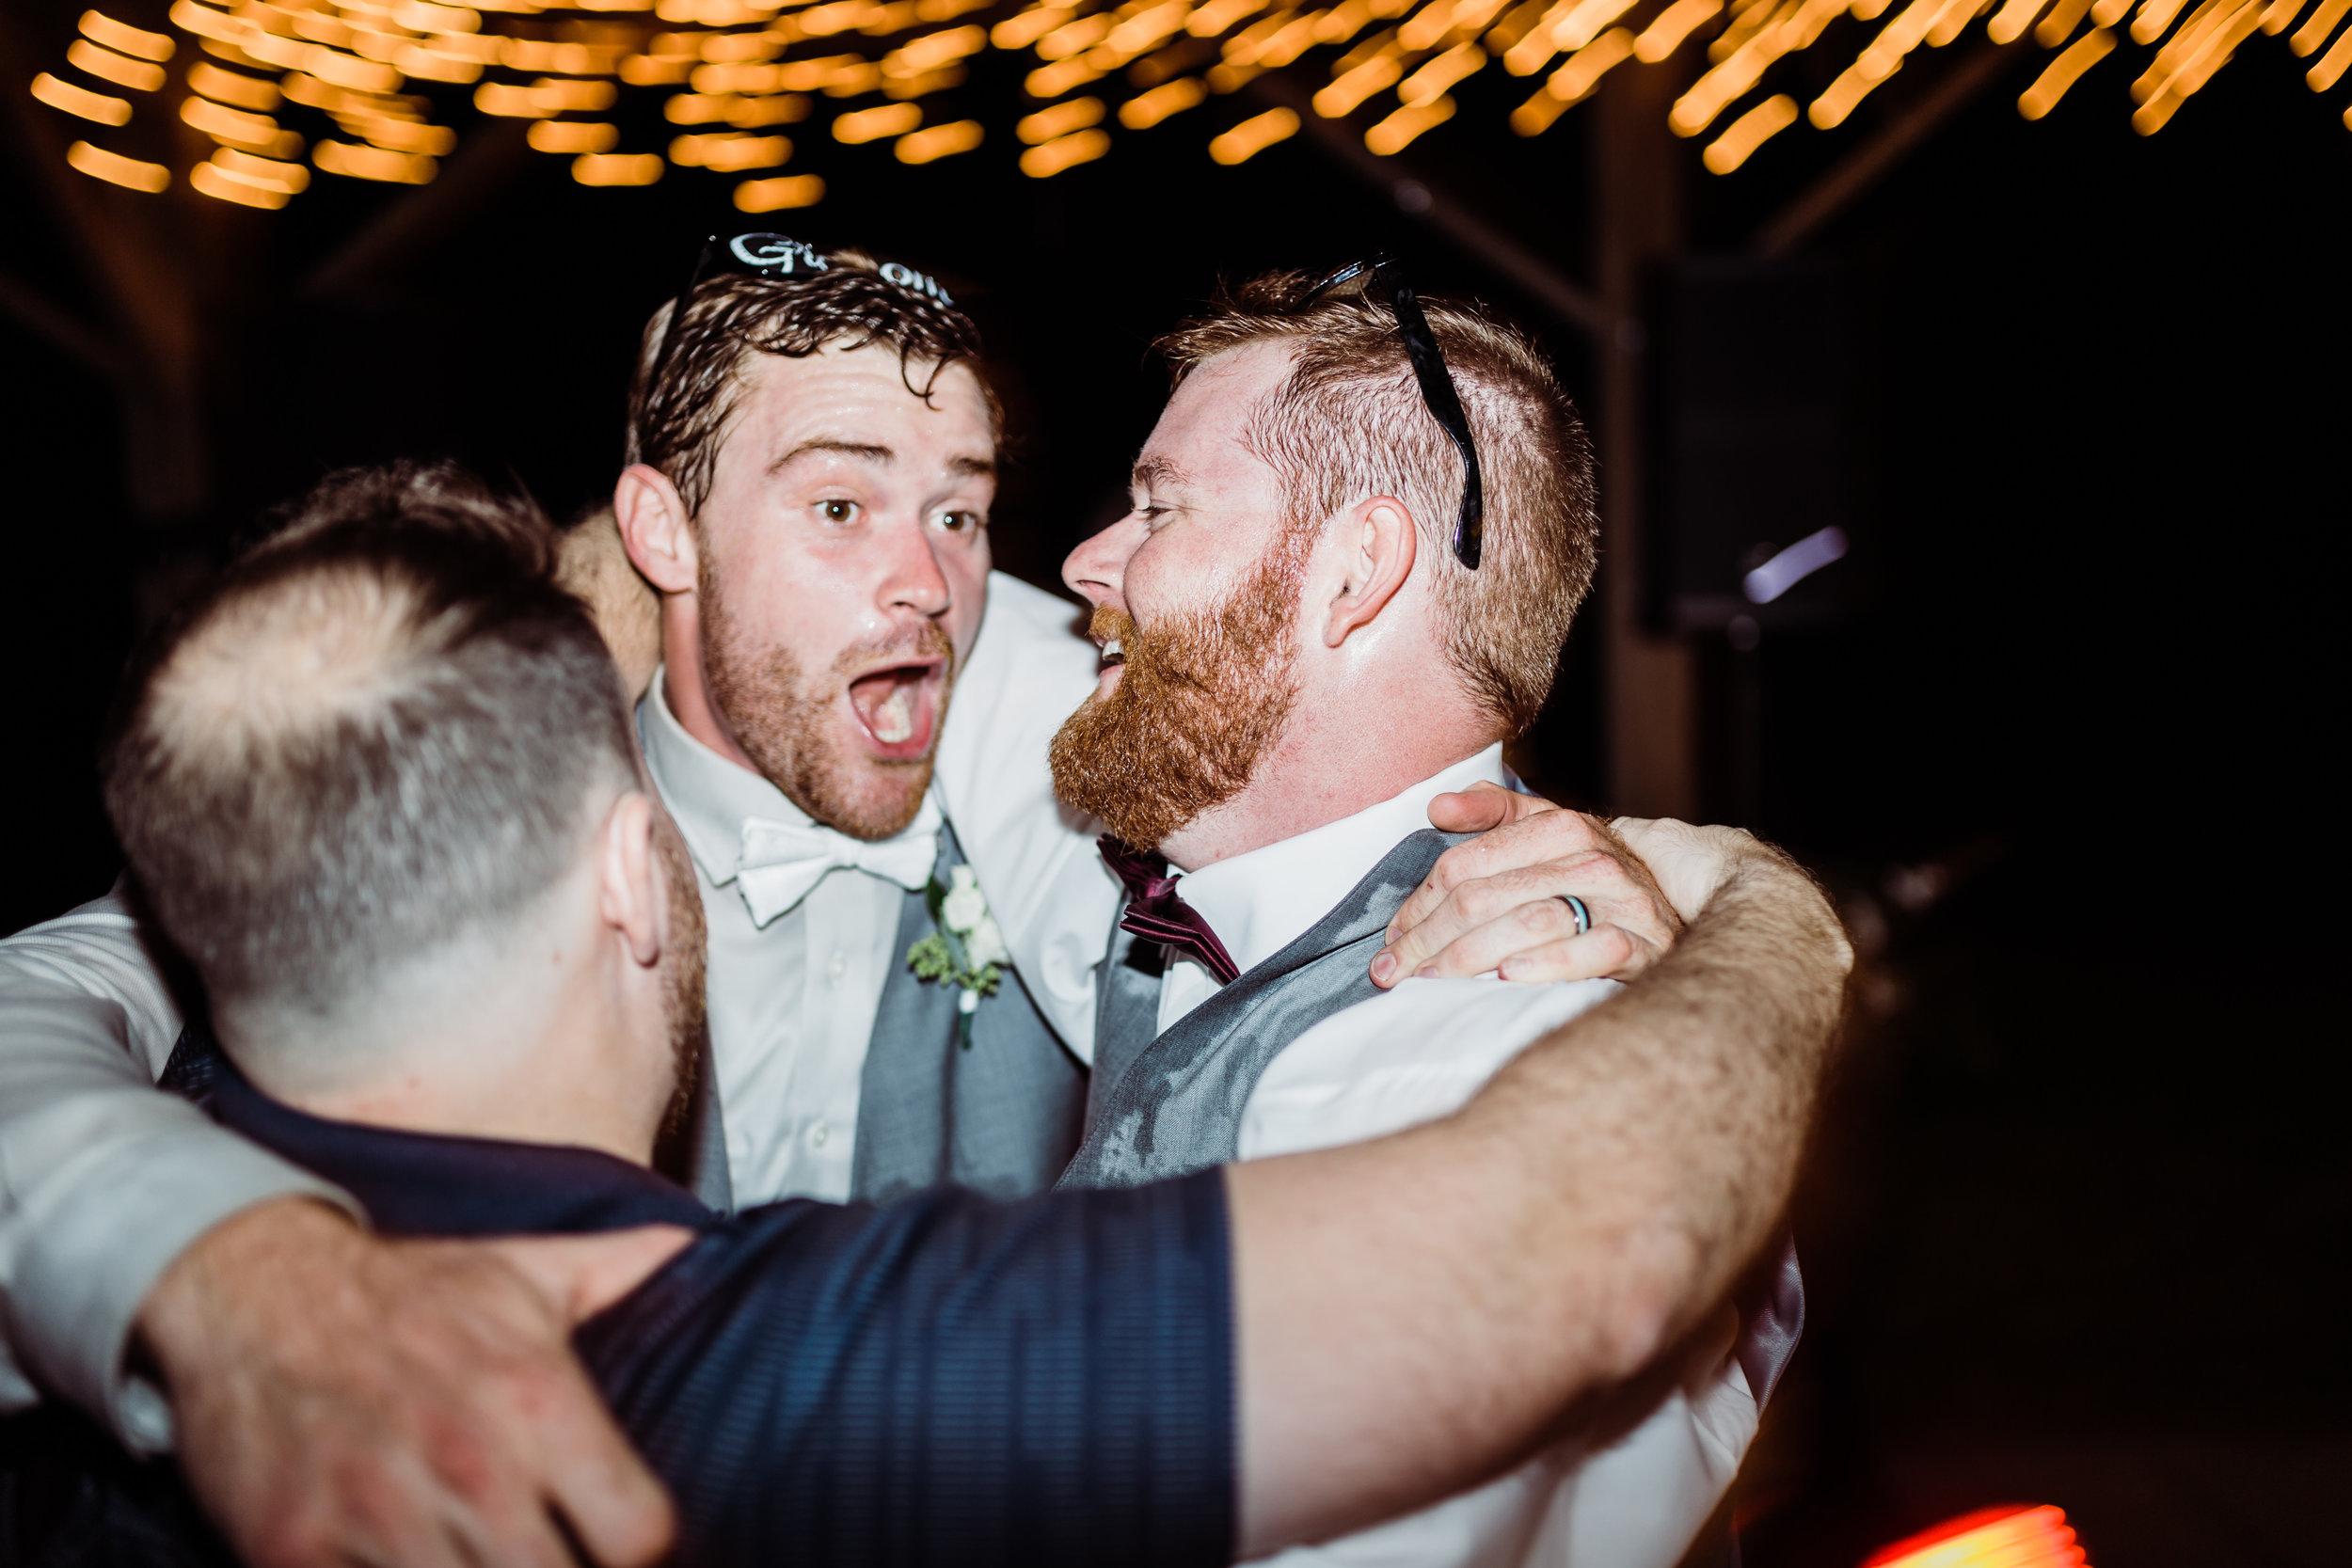 2017.10.14 Samantha and Matthew Crabtree Sarasota Wedding (653 of 708).jpg